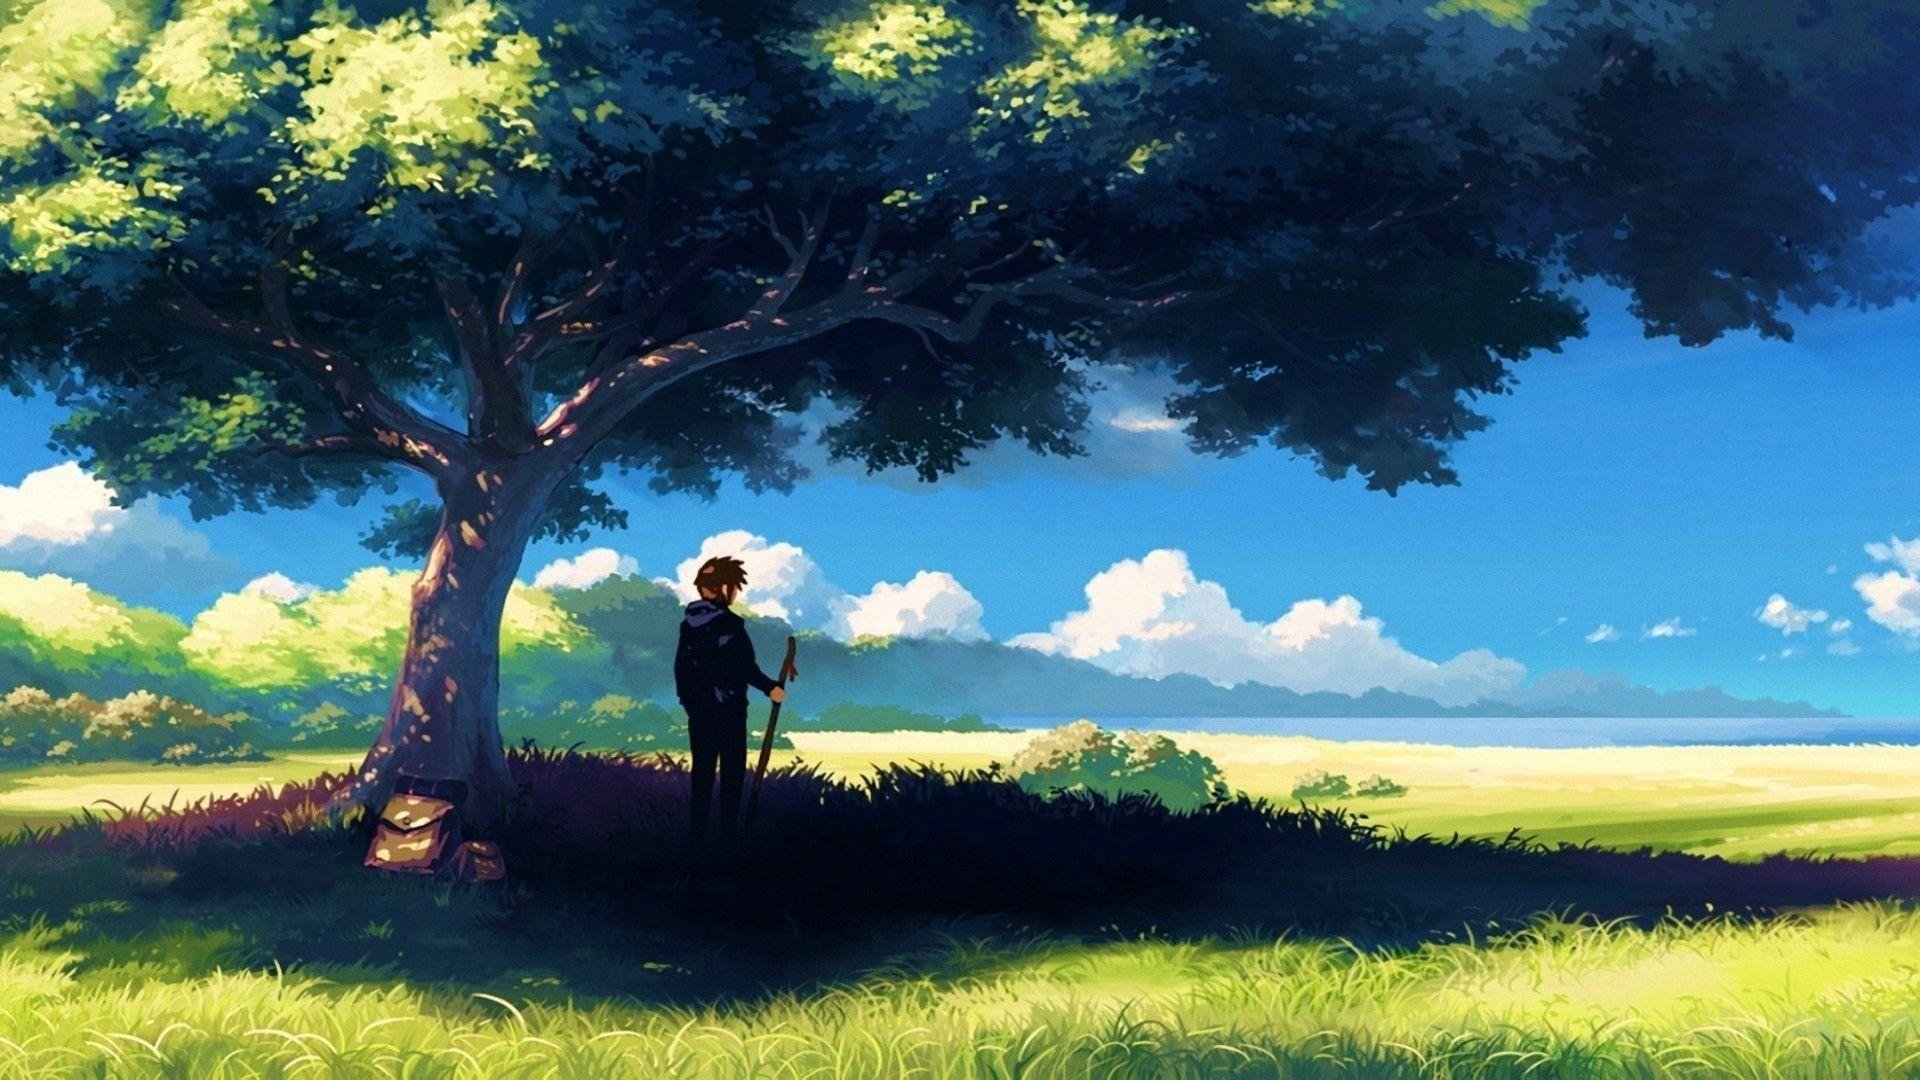 Beautiful Anime Scenery Wallpapers - Top Free Beautiful ...